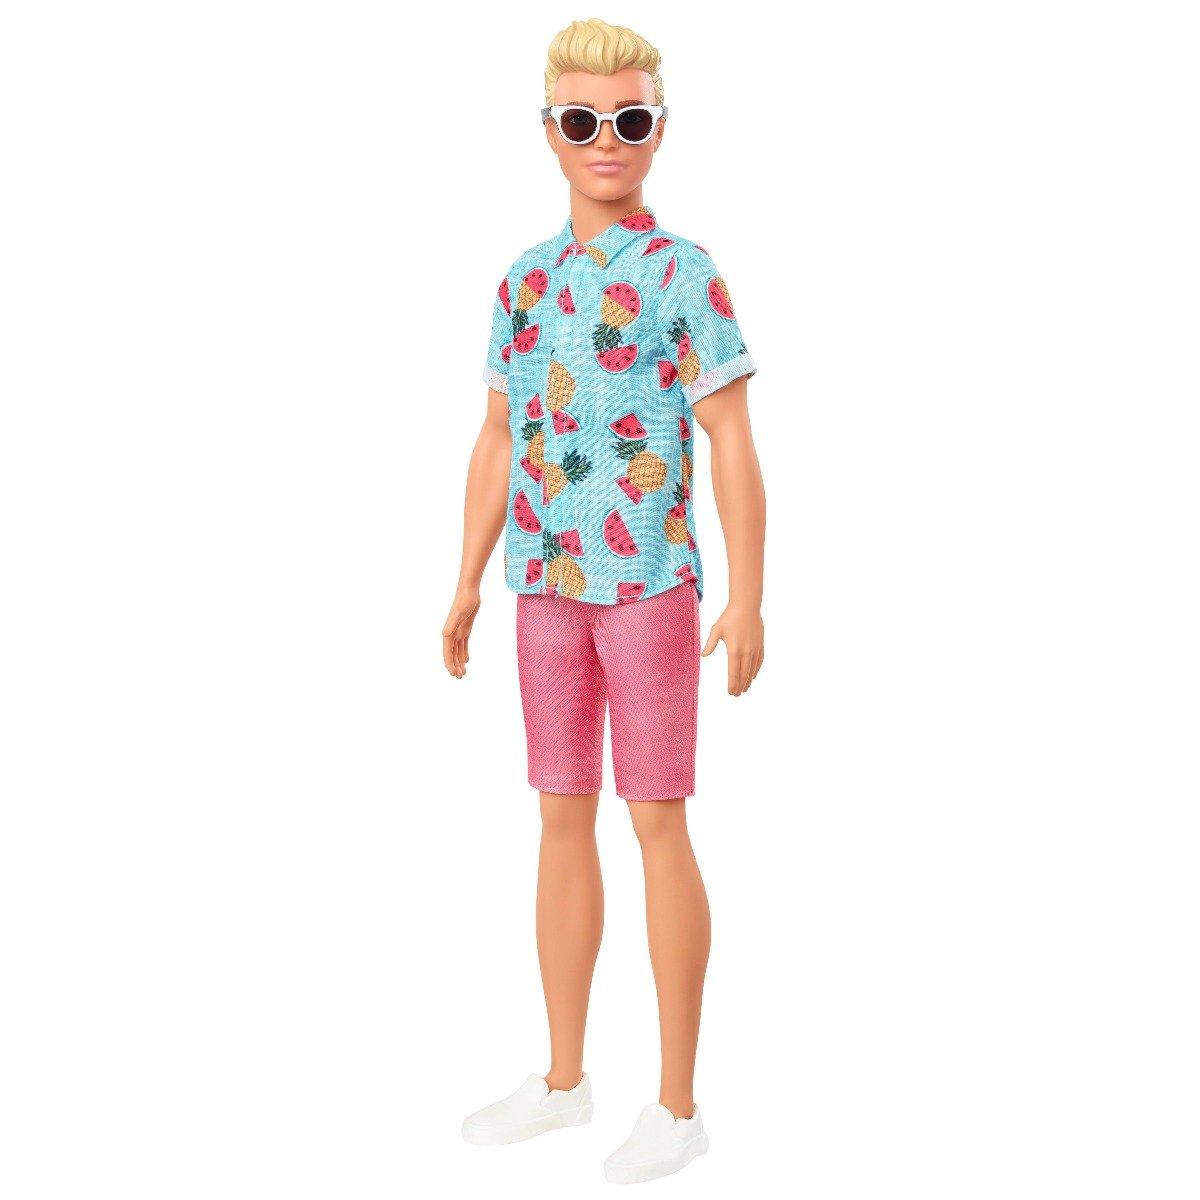 Papusa Barbie Fashionistas, Ken GYB04